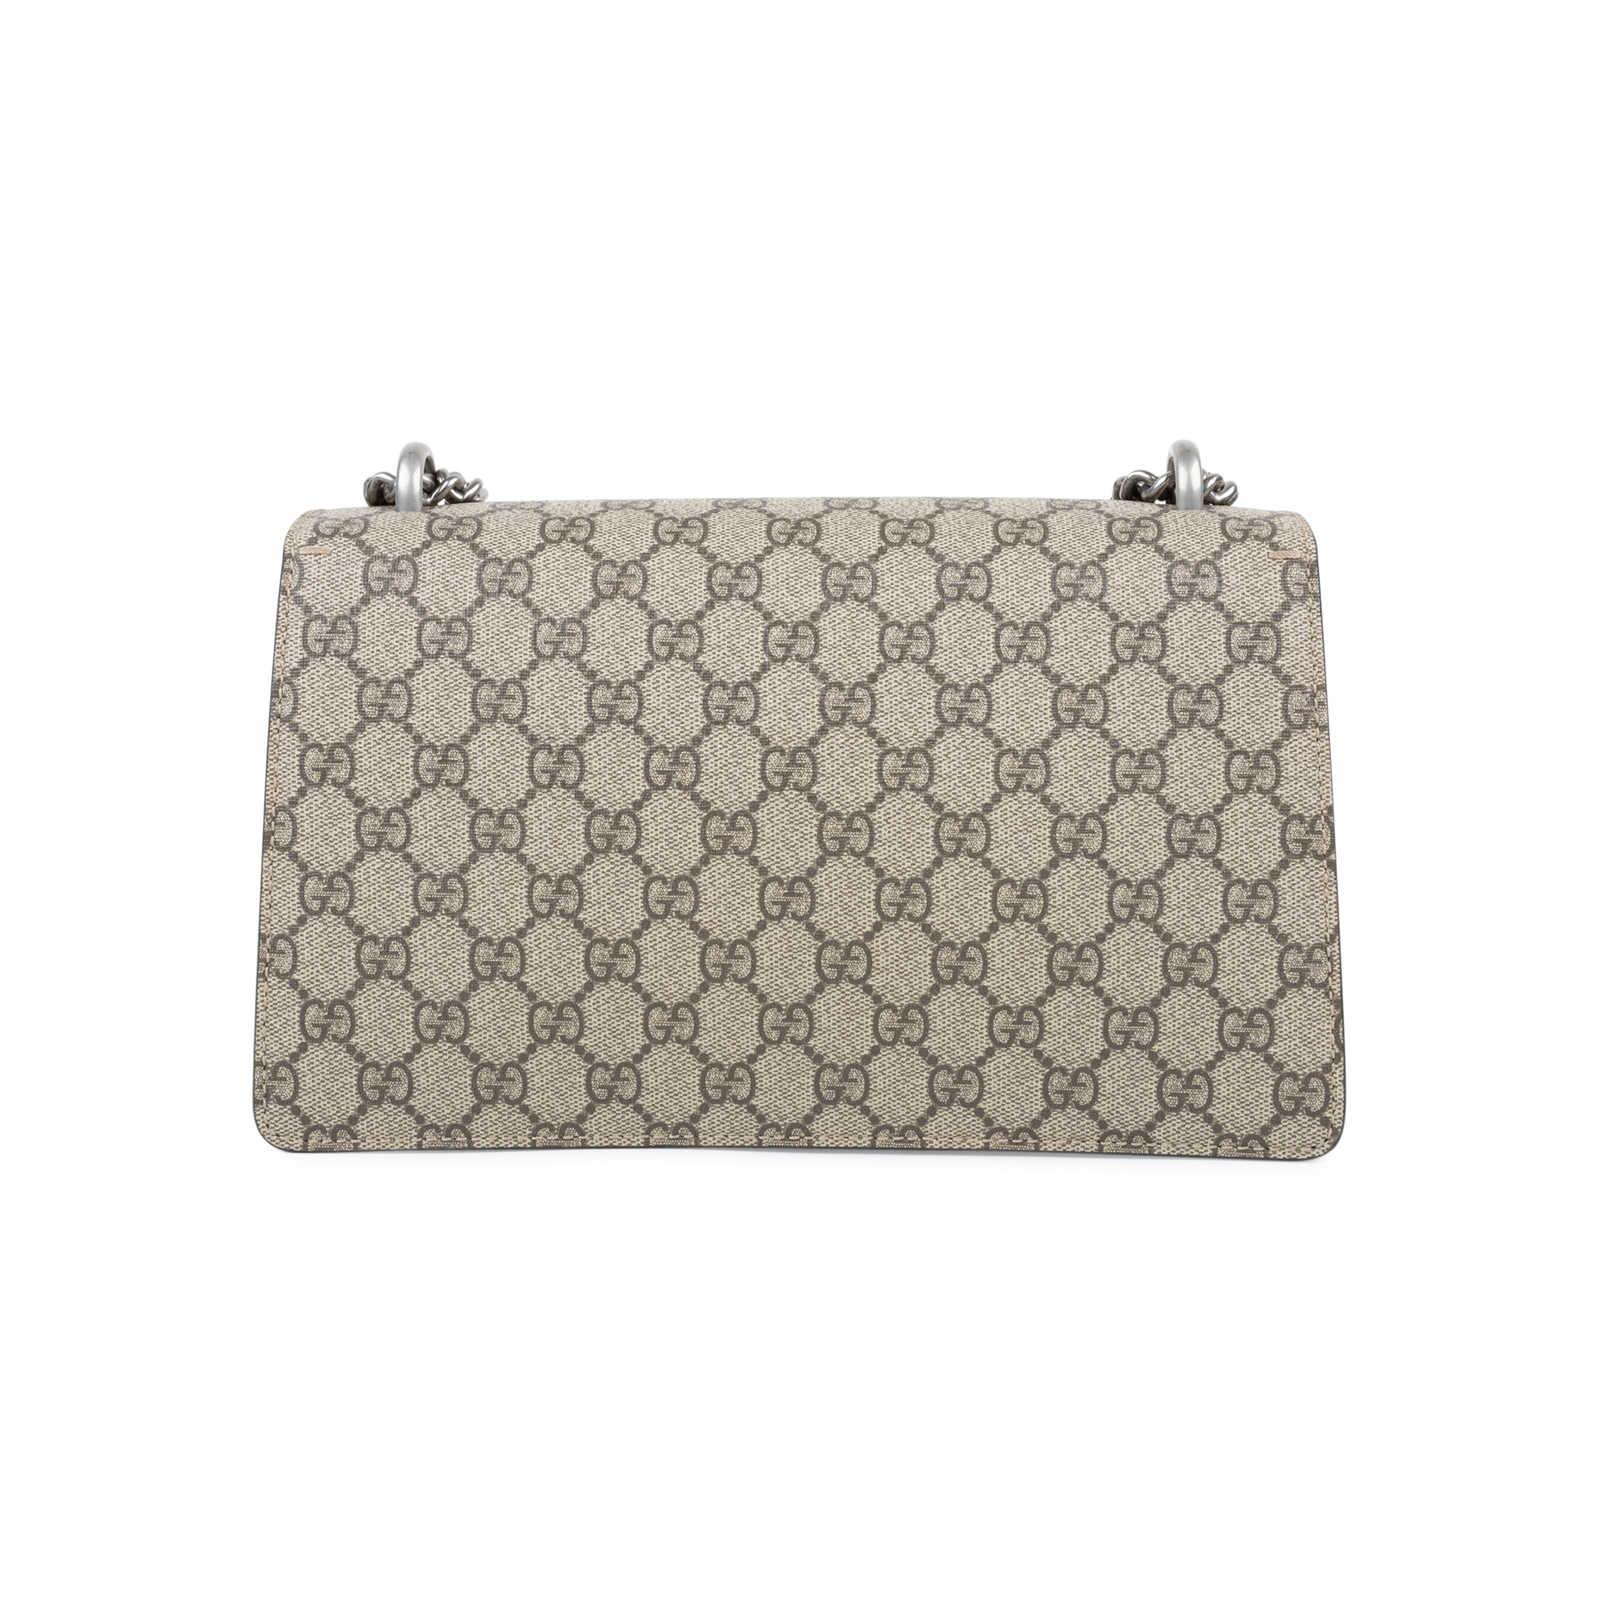 76045f3f533 ... Authentic Second Hand Gucci Dionysus GG Supreme Medium Bag  (PSS-588-00010) ...